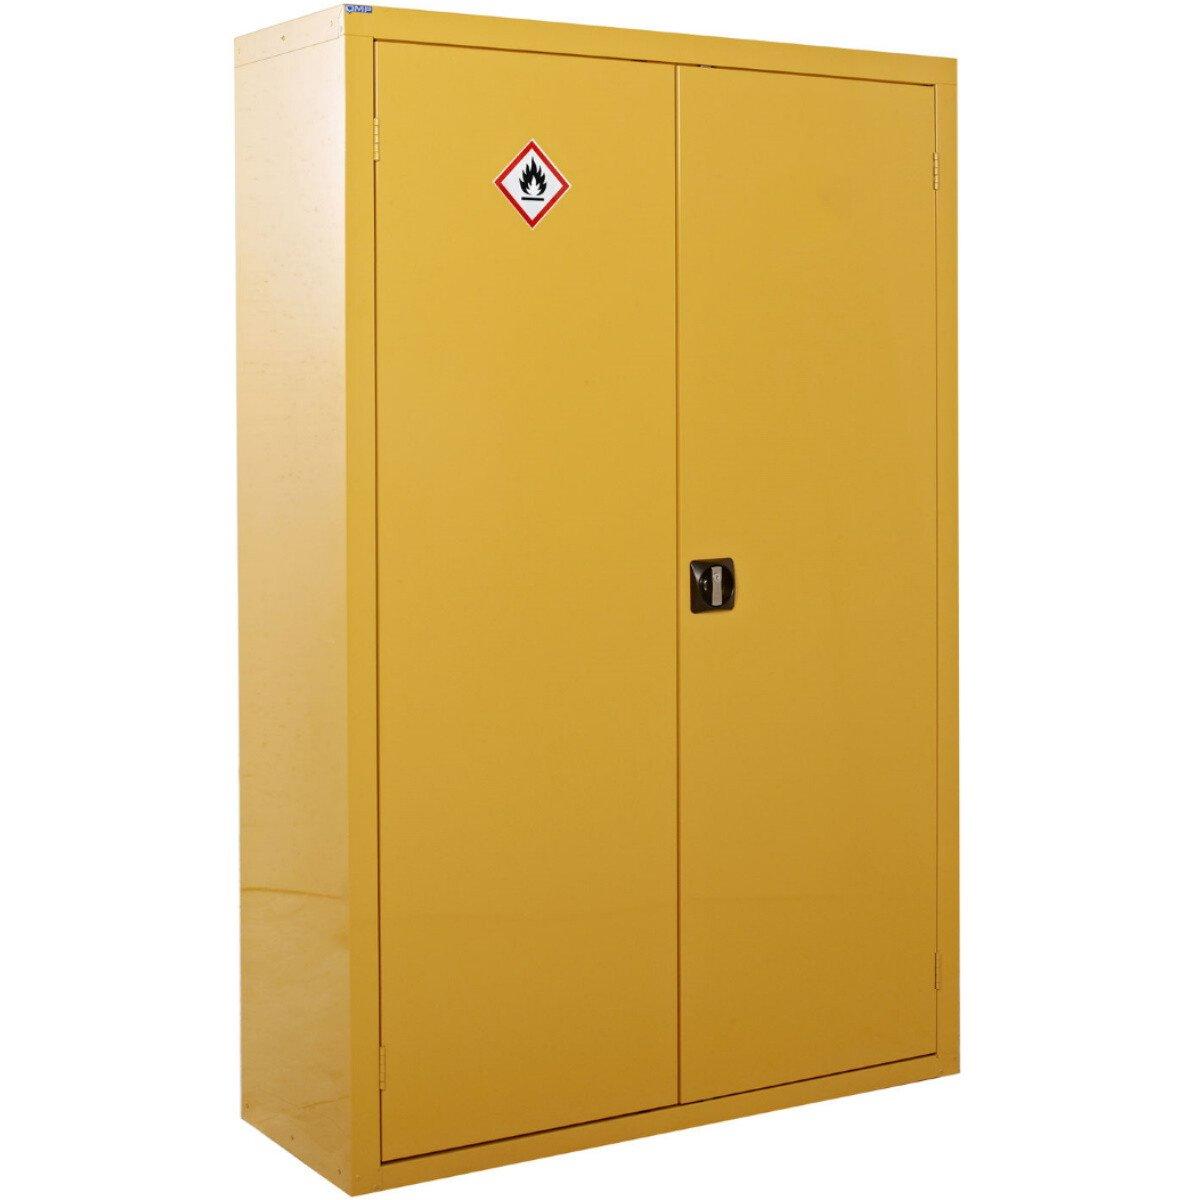 QMP CZ181246 Hazardous Substance Cupboard 1800 x 1200 x 460mm